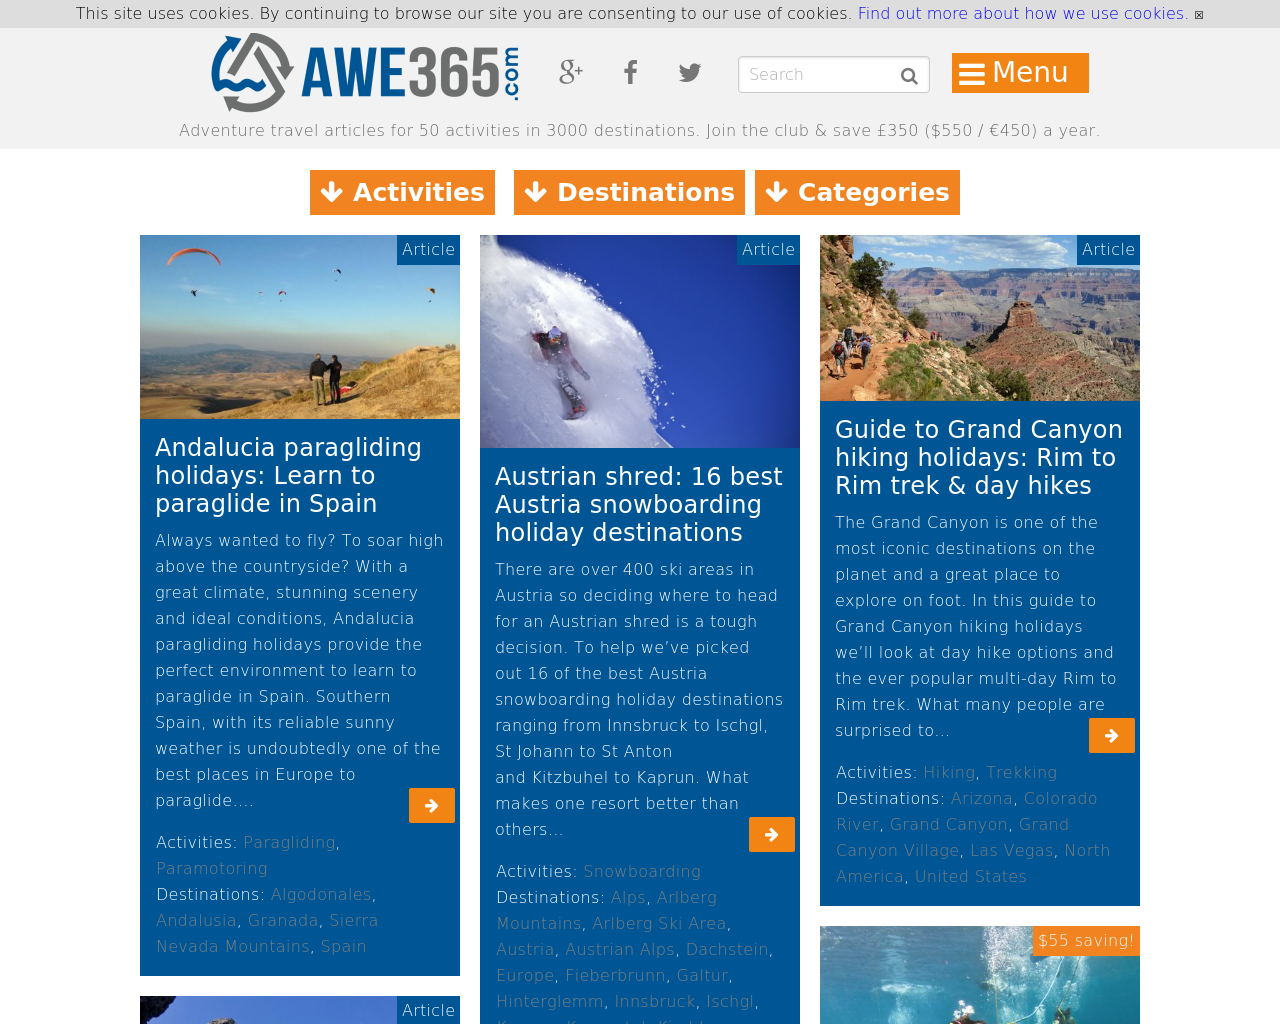 ParaglideGuide.com-Advertising-Reviews-Pricing